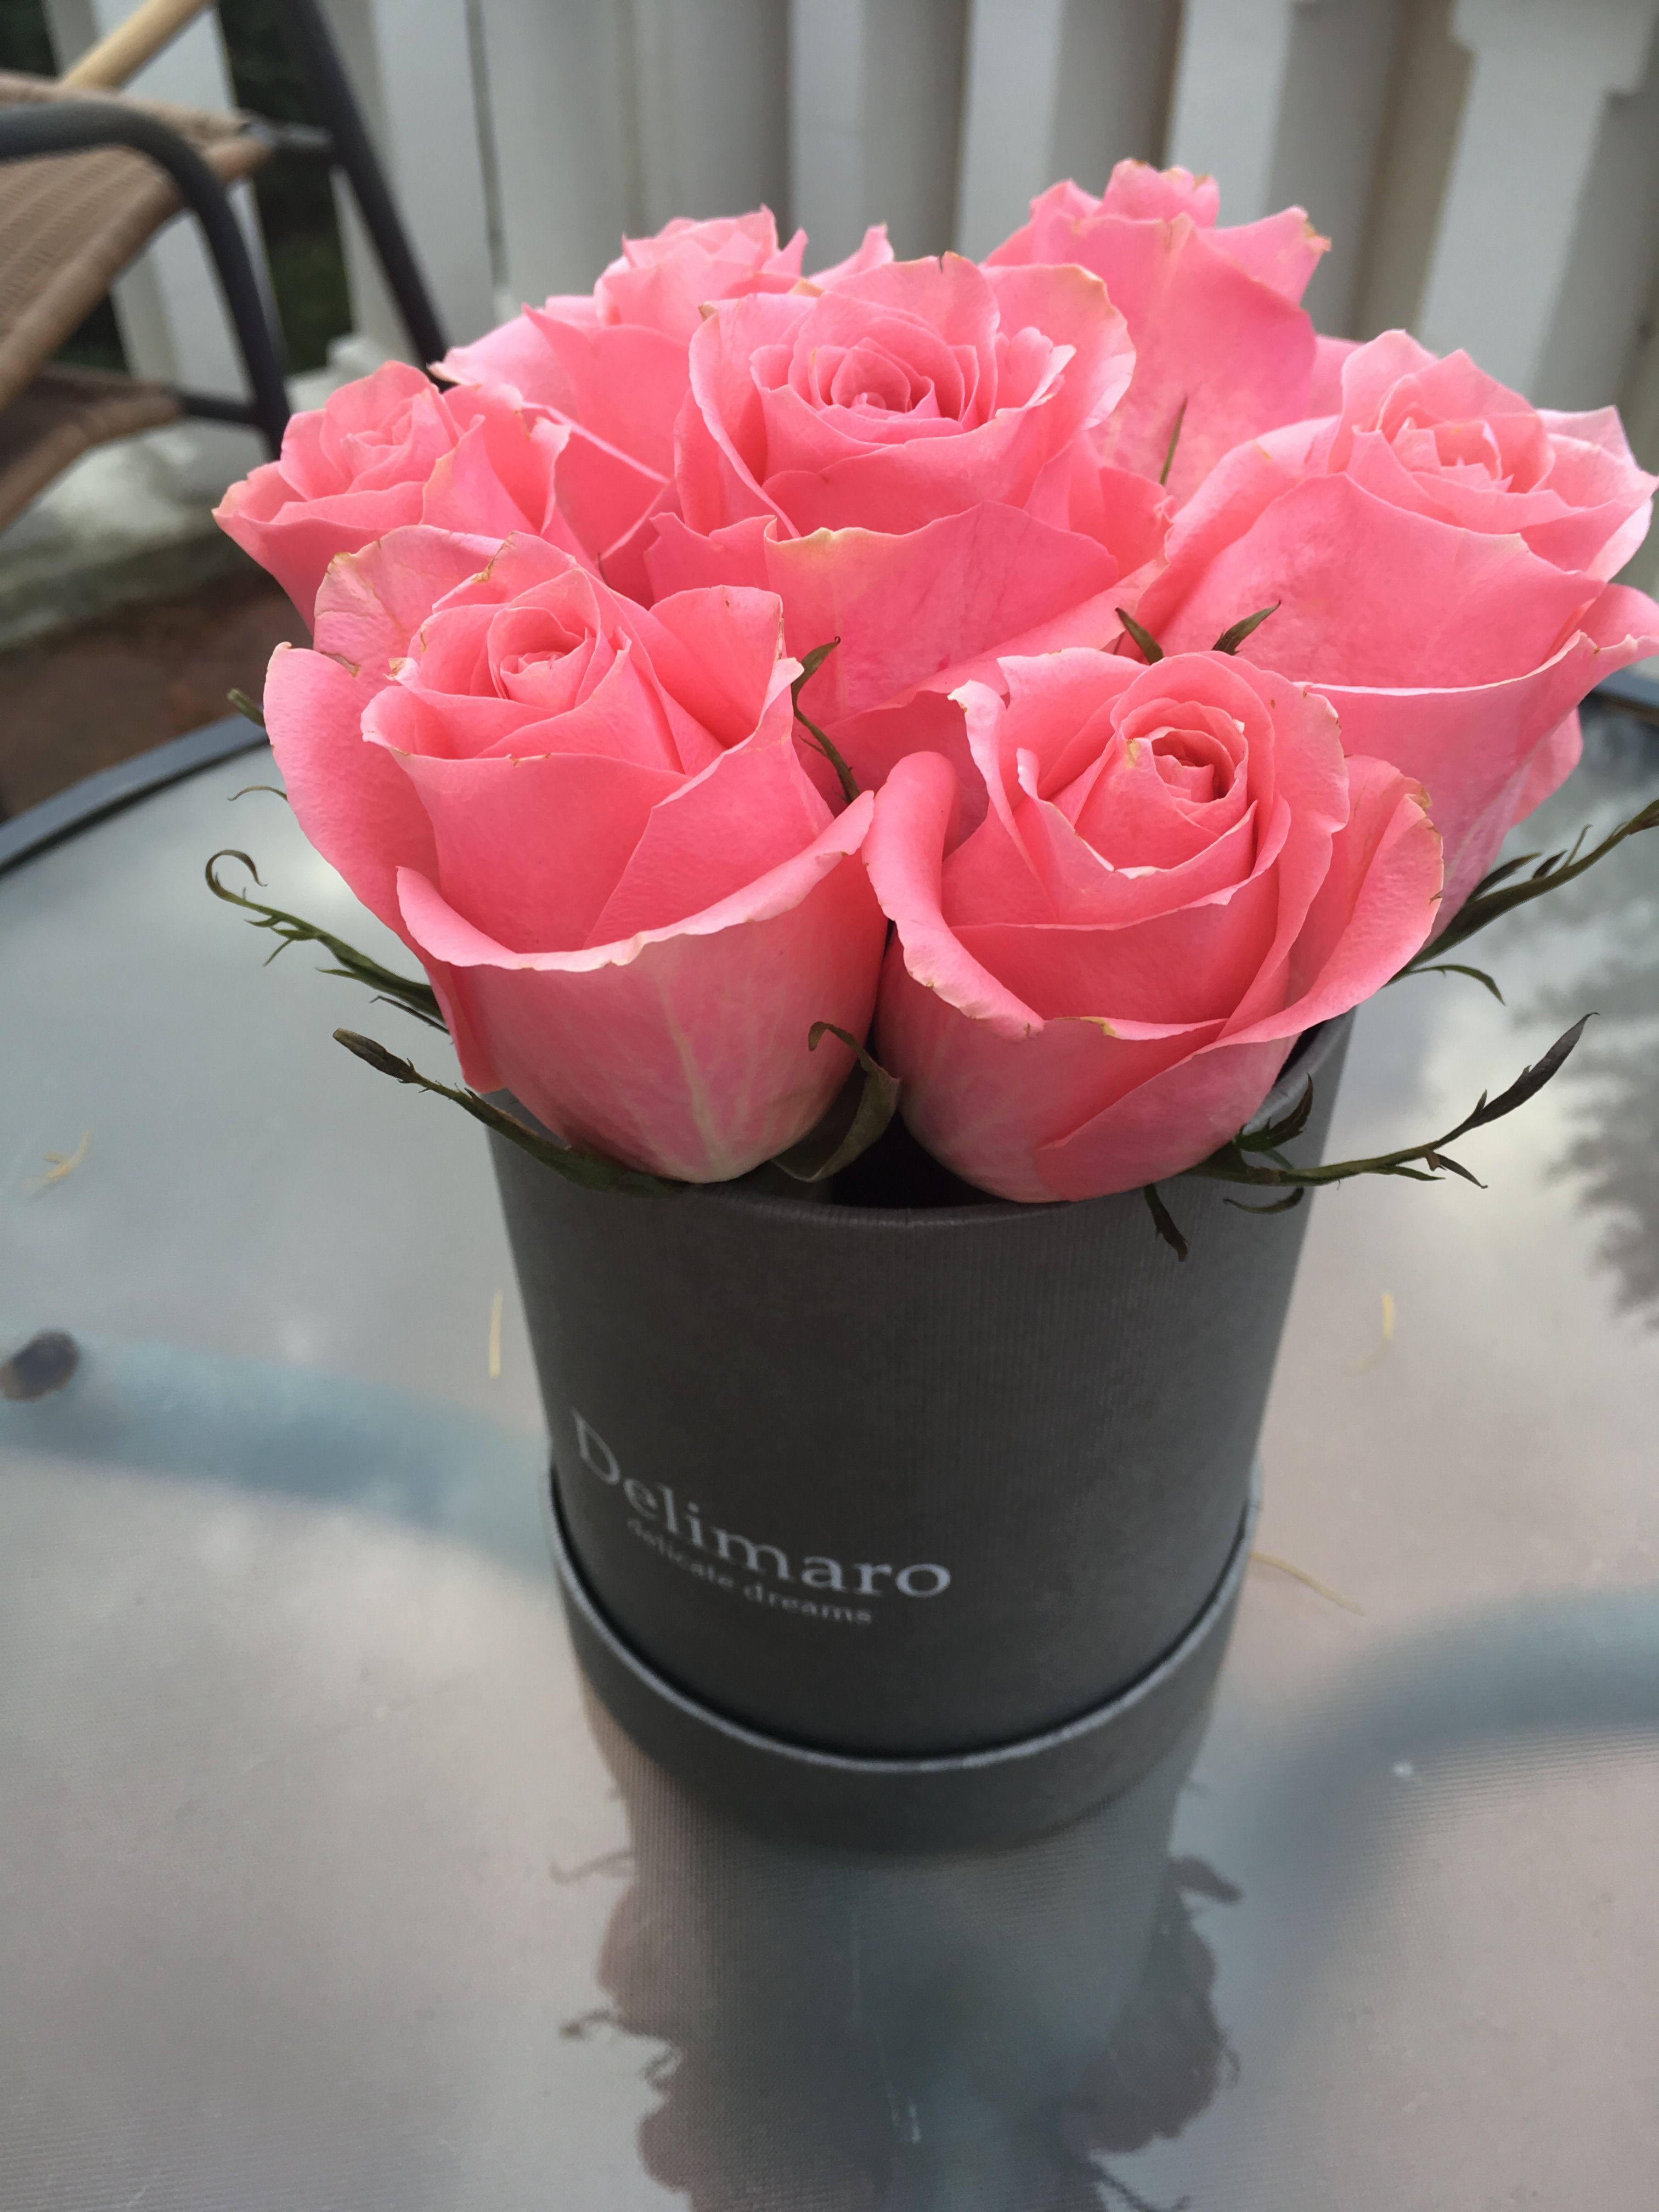 Pin On Kwiaty W Pudelku Flowerbox Delimaro